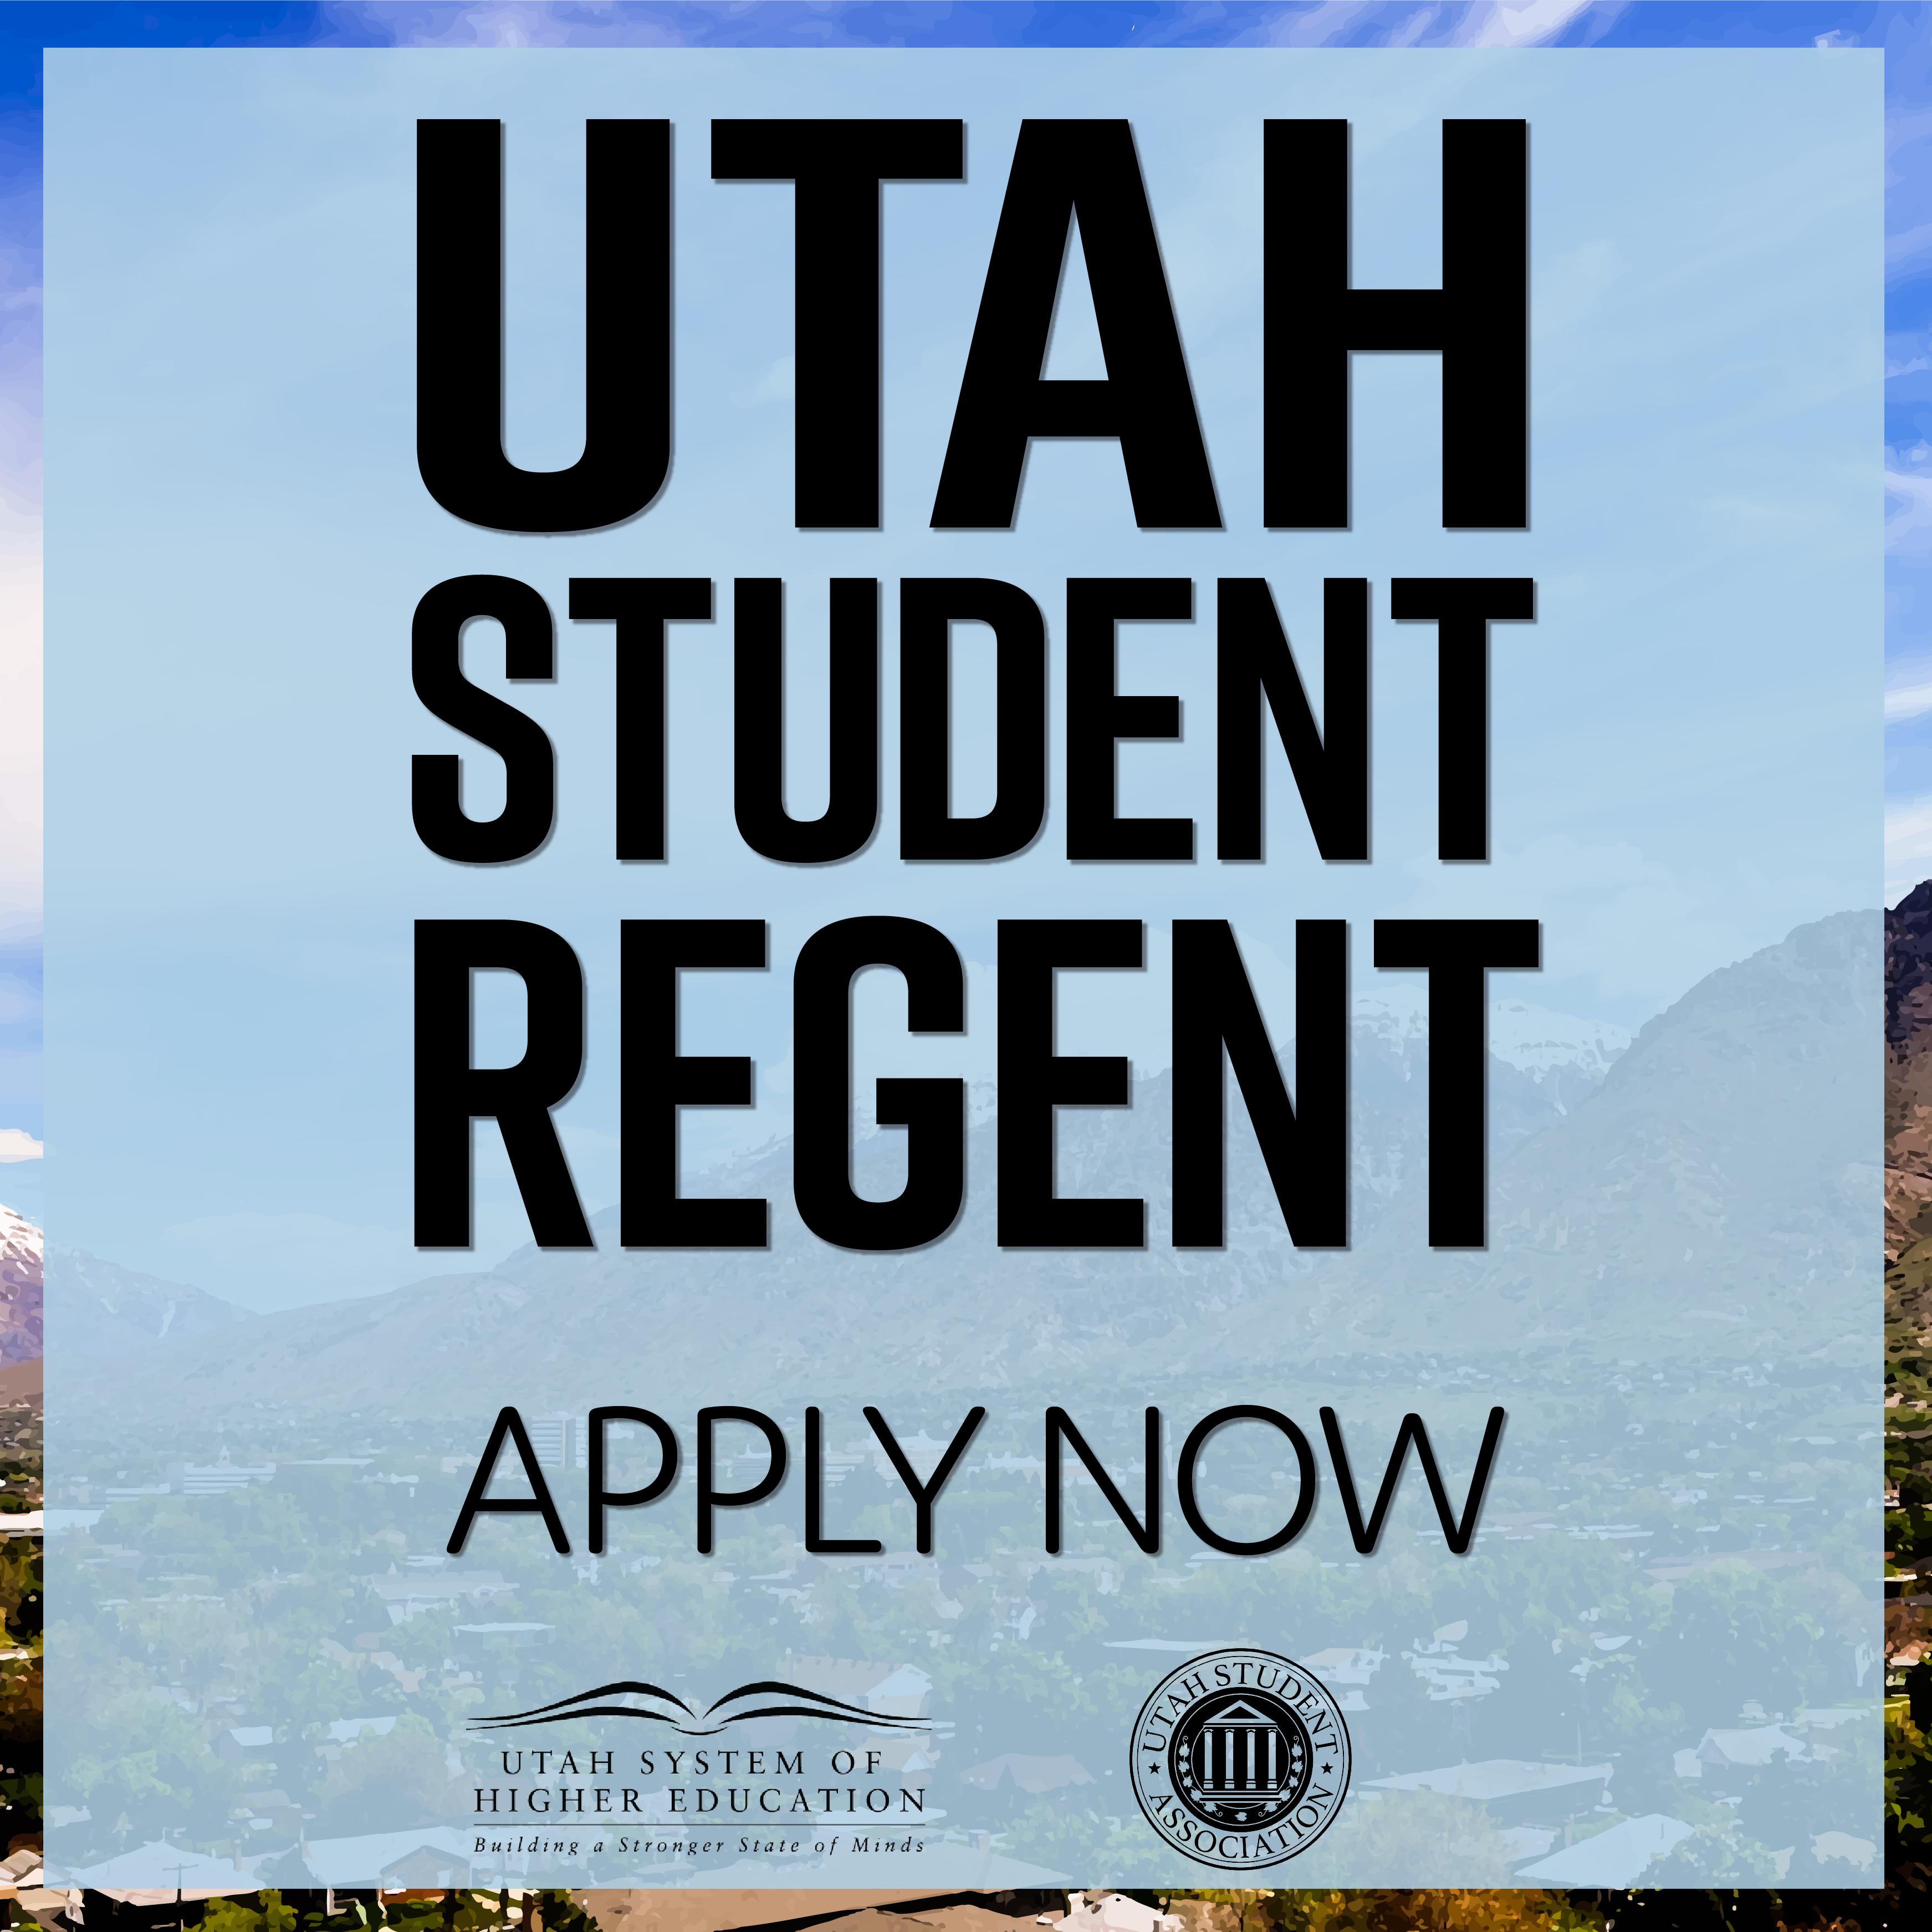 Utah Student Regent Application